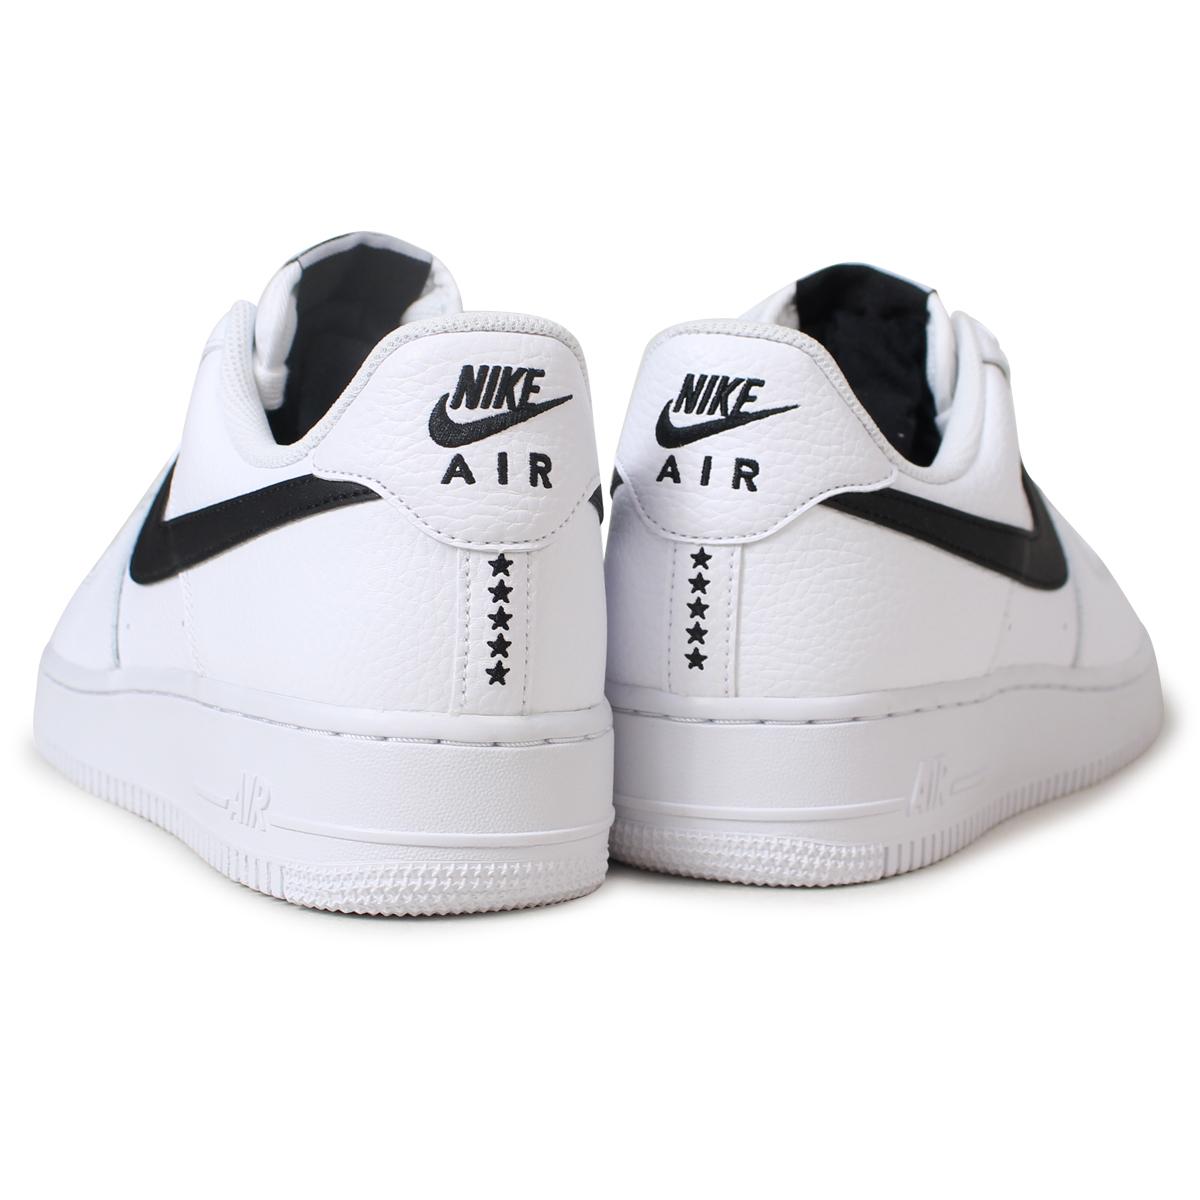 NIKE AIR FORCE 1 Nike air force 1 07 sneakers men AA4083 103 white